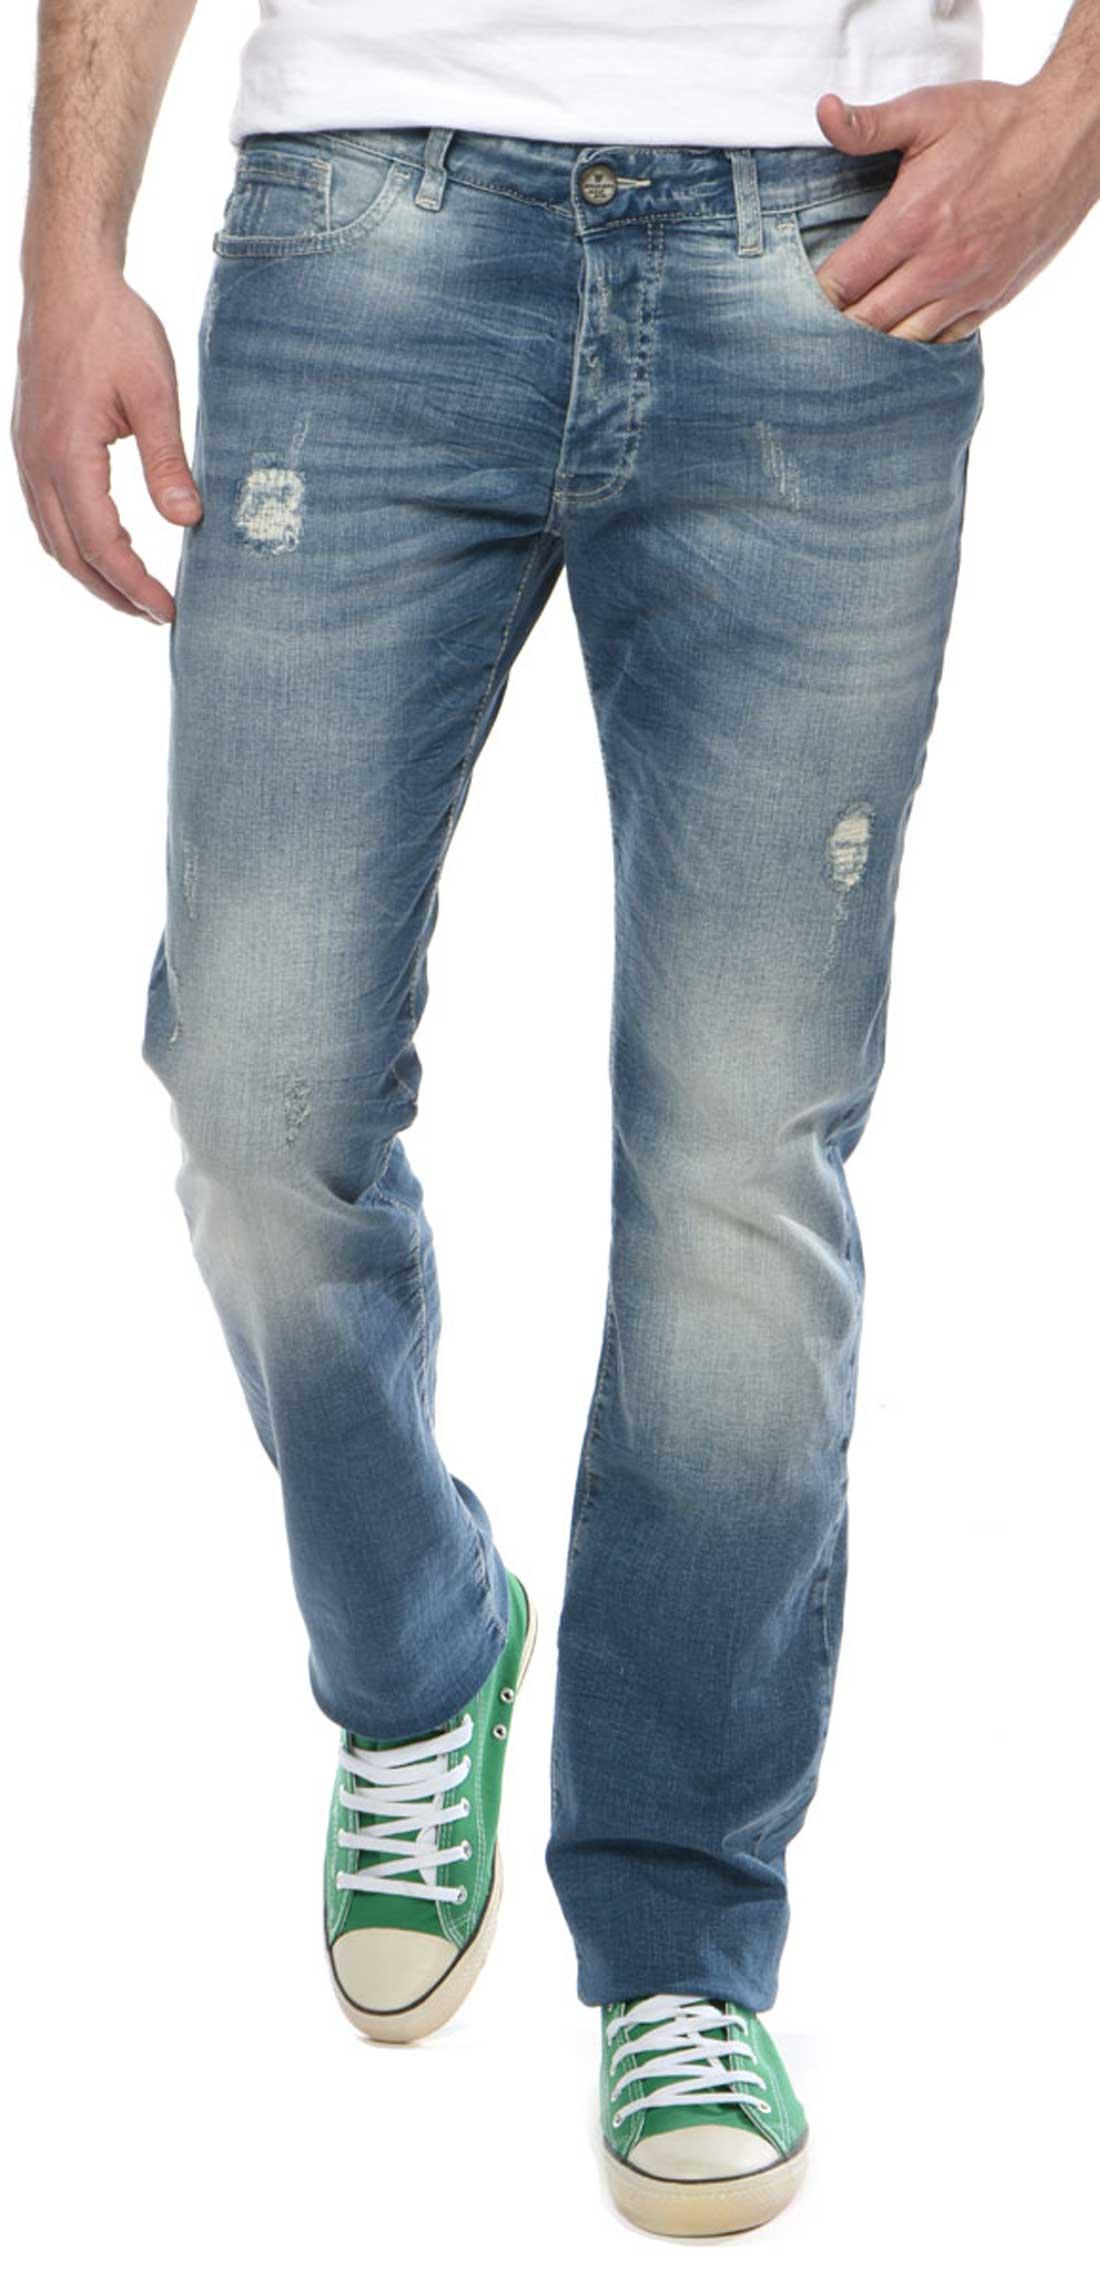 3d7c6624002c Brokers - 18017-205-32 - Blue - παντελόνι Jean - Glami.gr